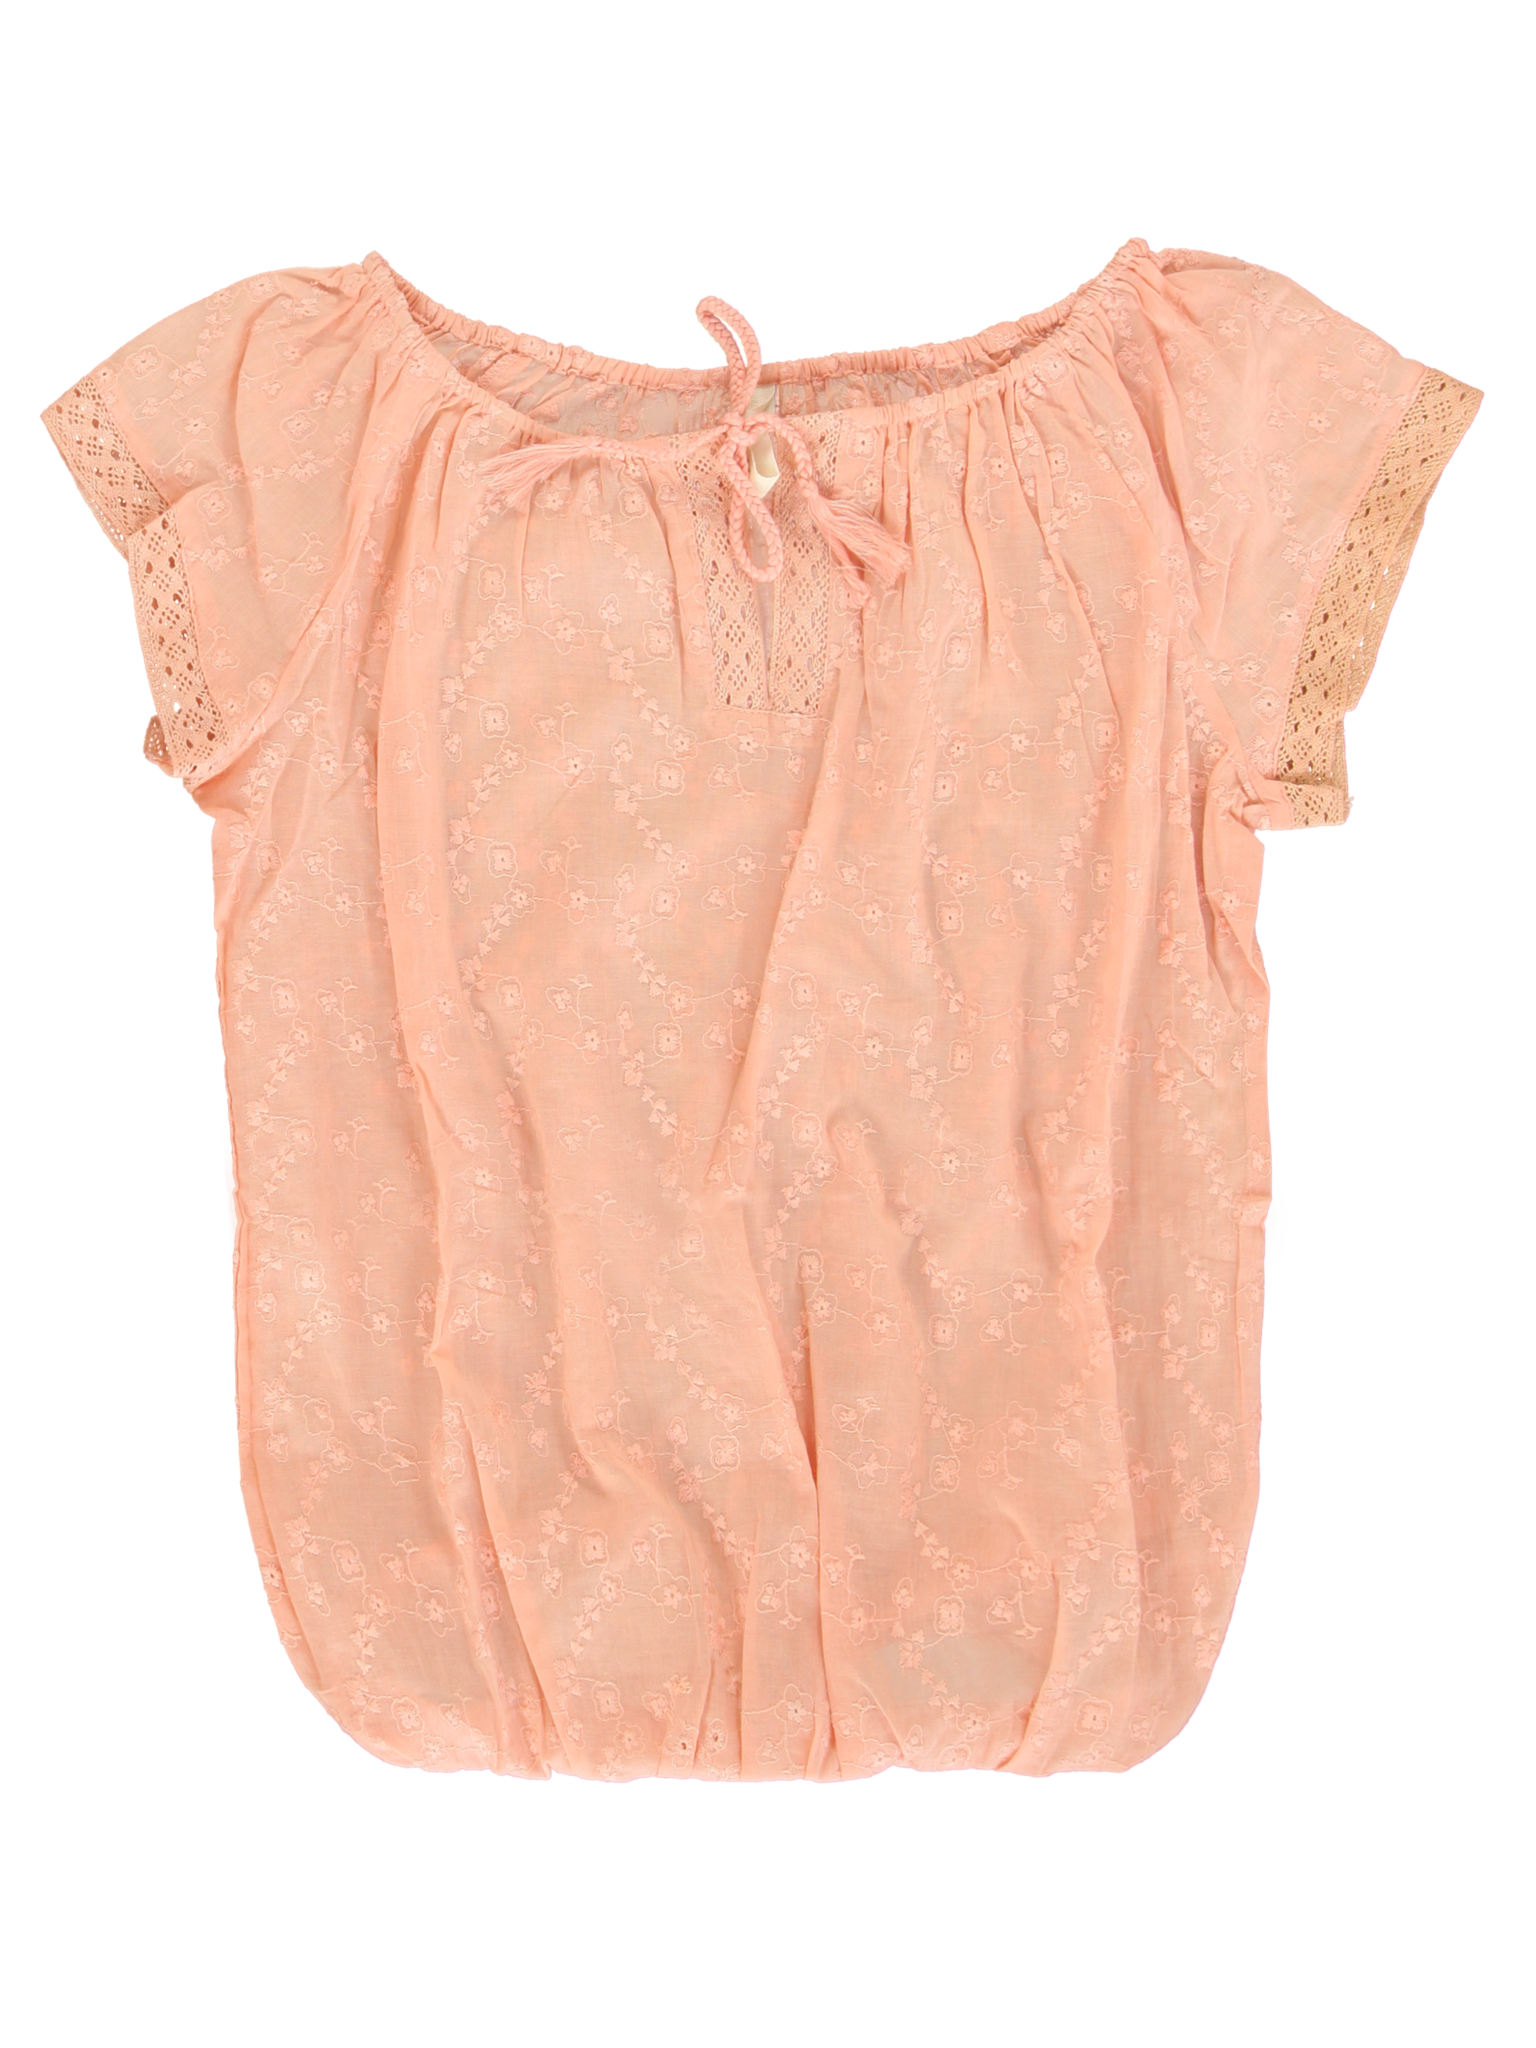 All Brands   Summerproducts Ladies   Blouse   18 pcs/box